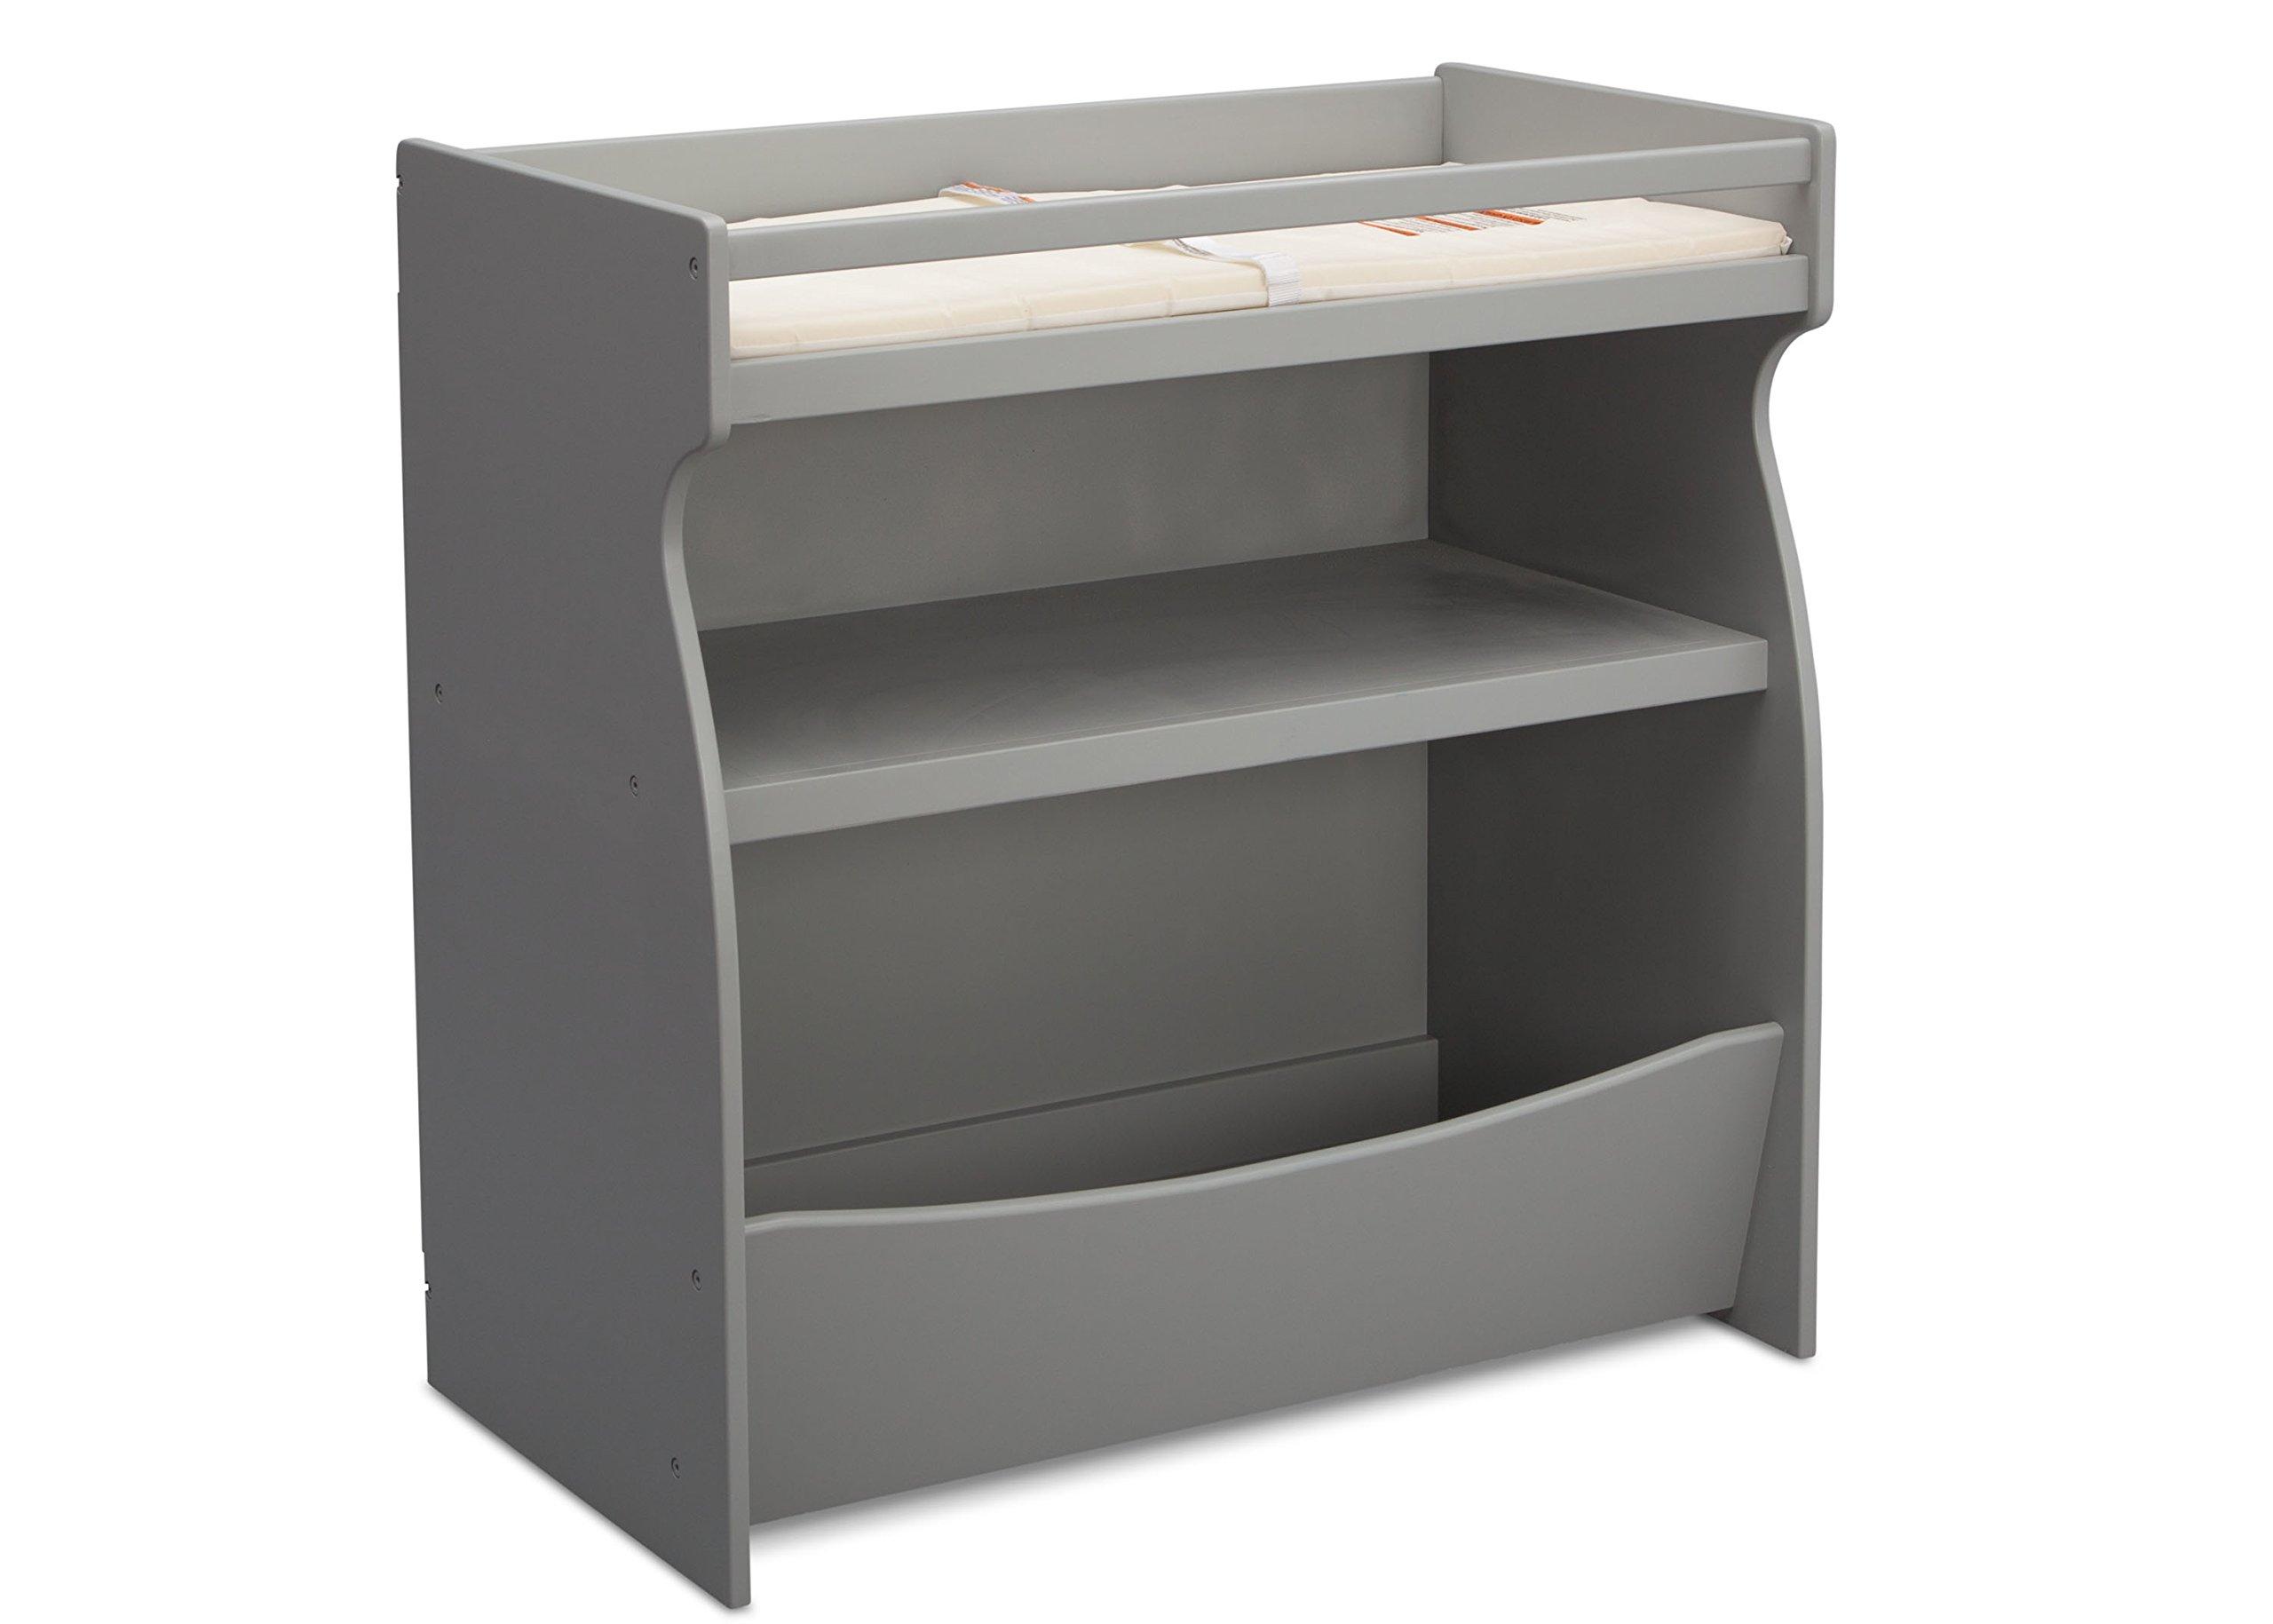 Delta Children 2-in-1 Changing Table and Storage Unit, Grey by Delta Children